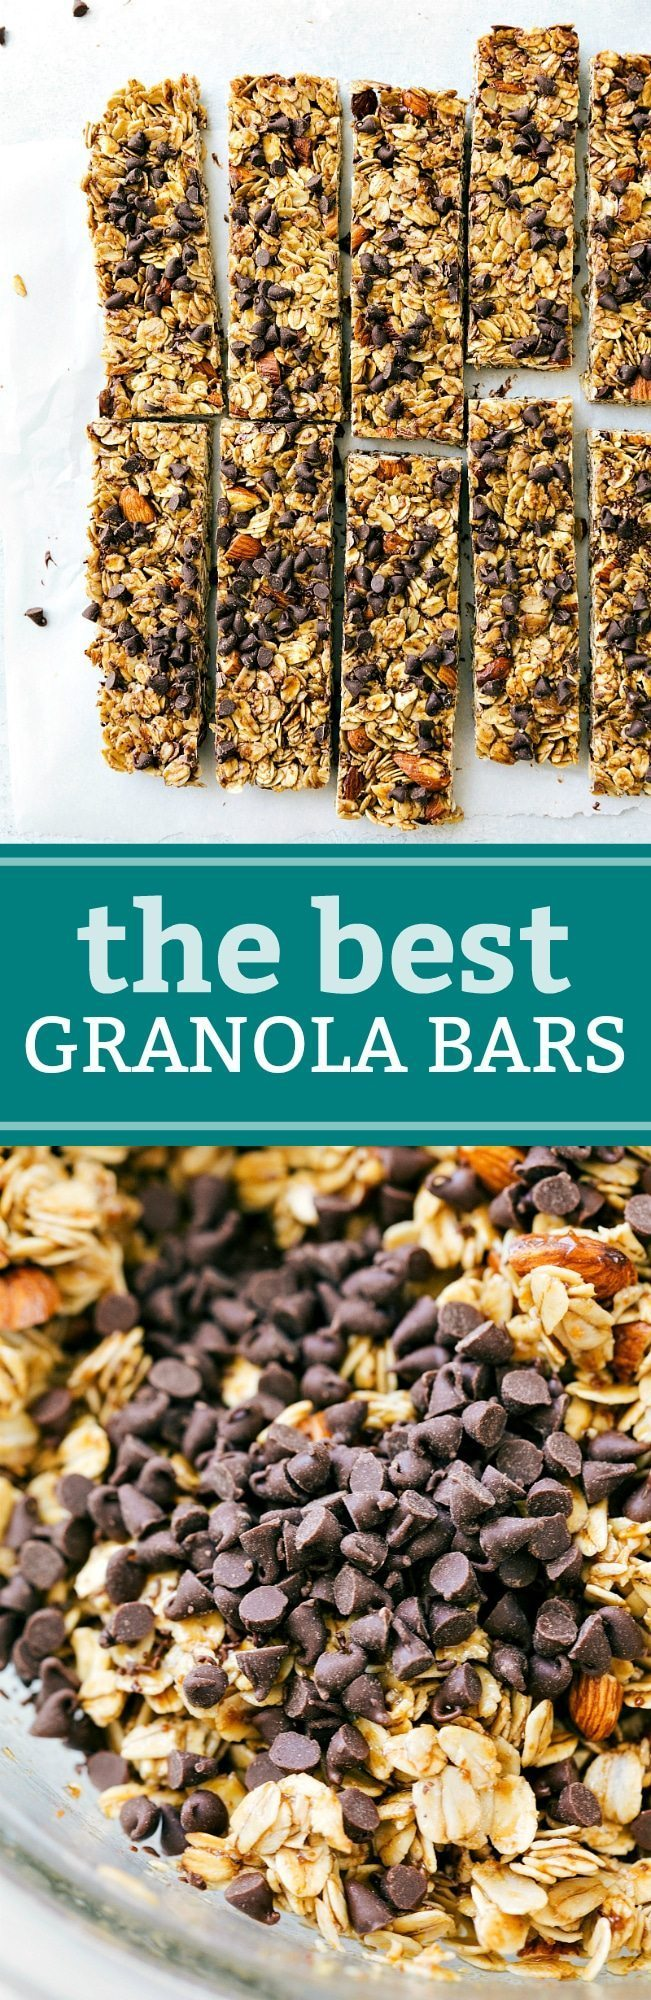 Homemade Granola Bars | Chelsea's Messy Apron